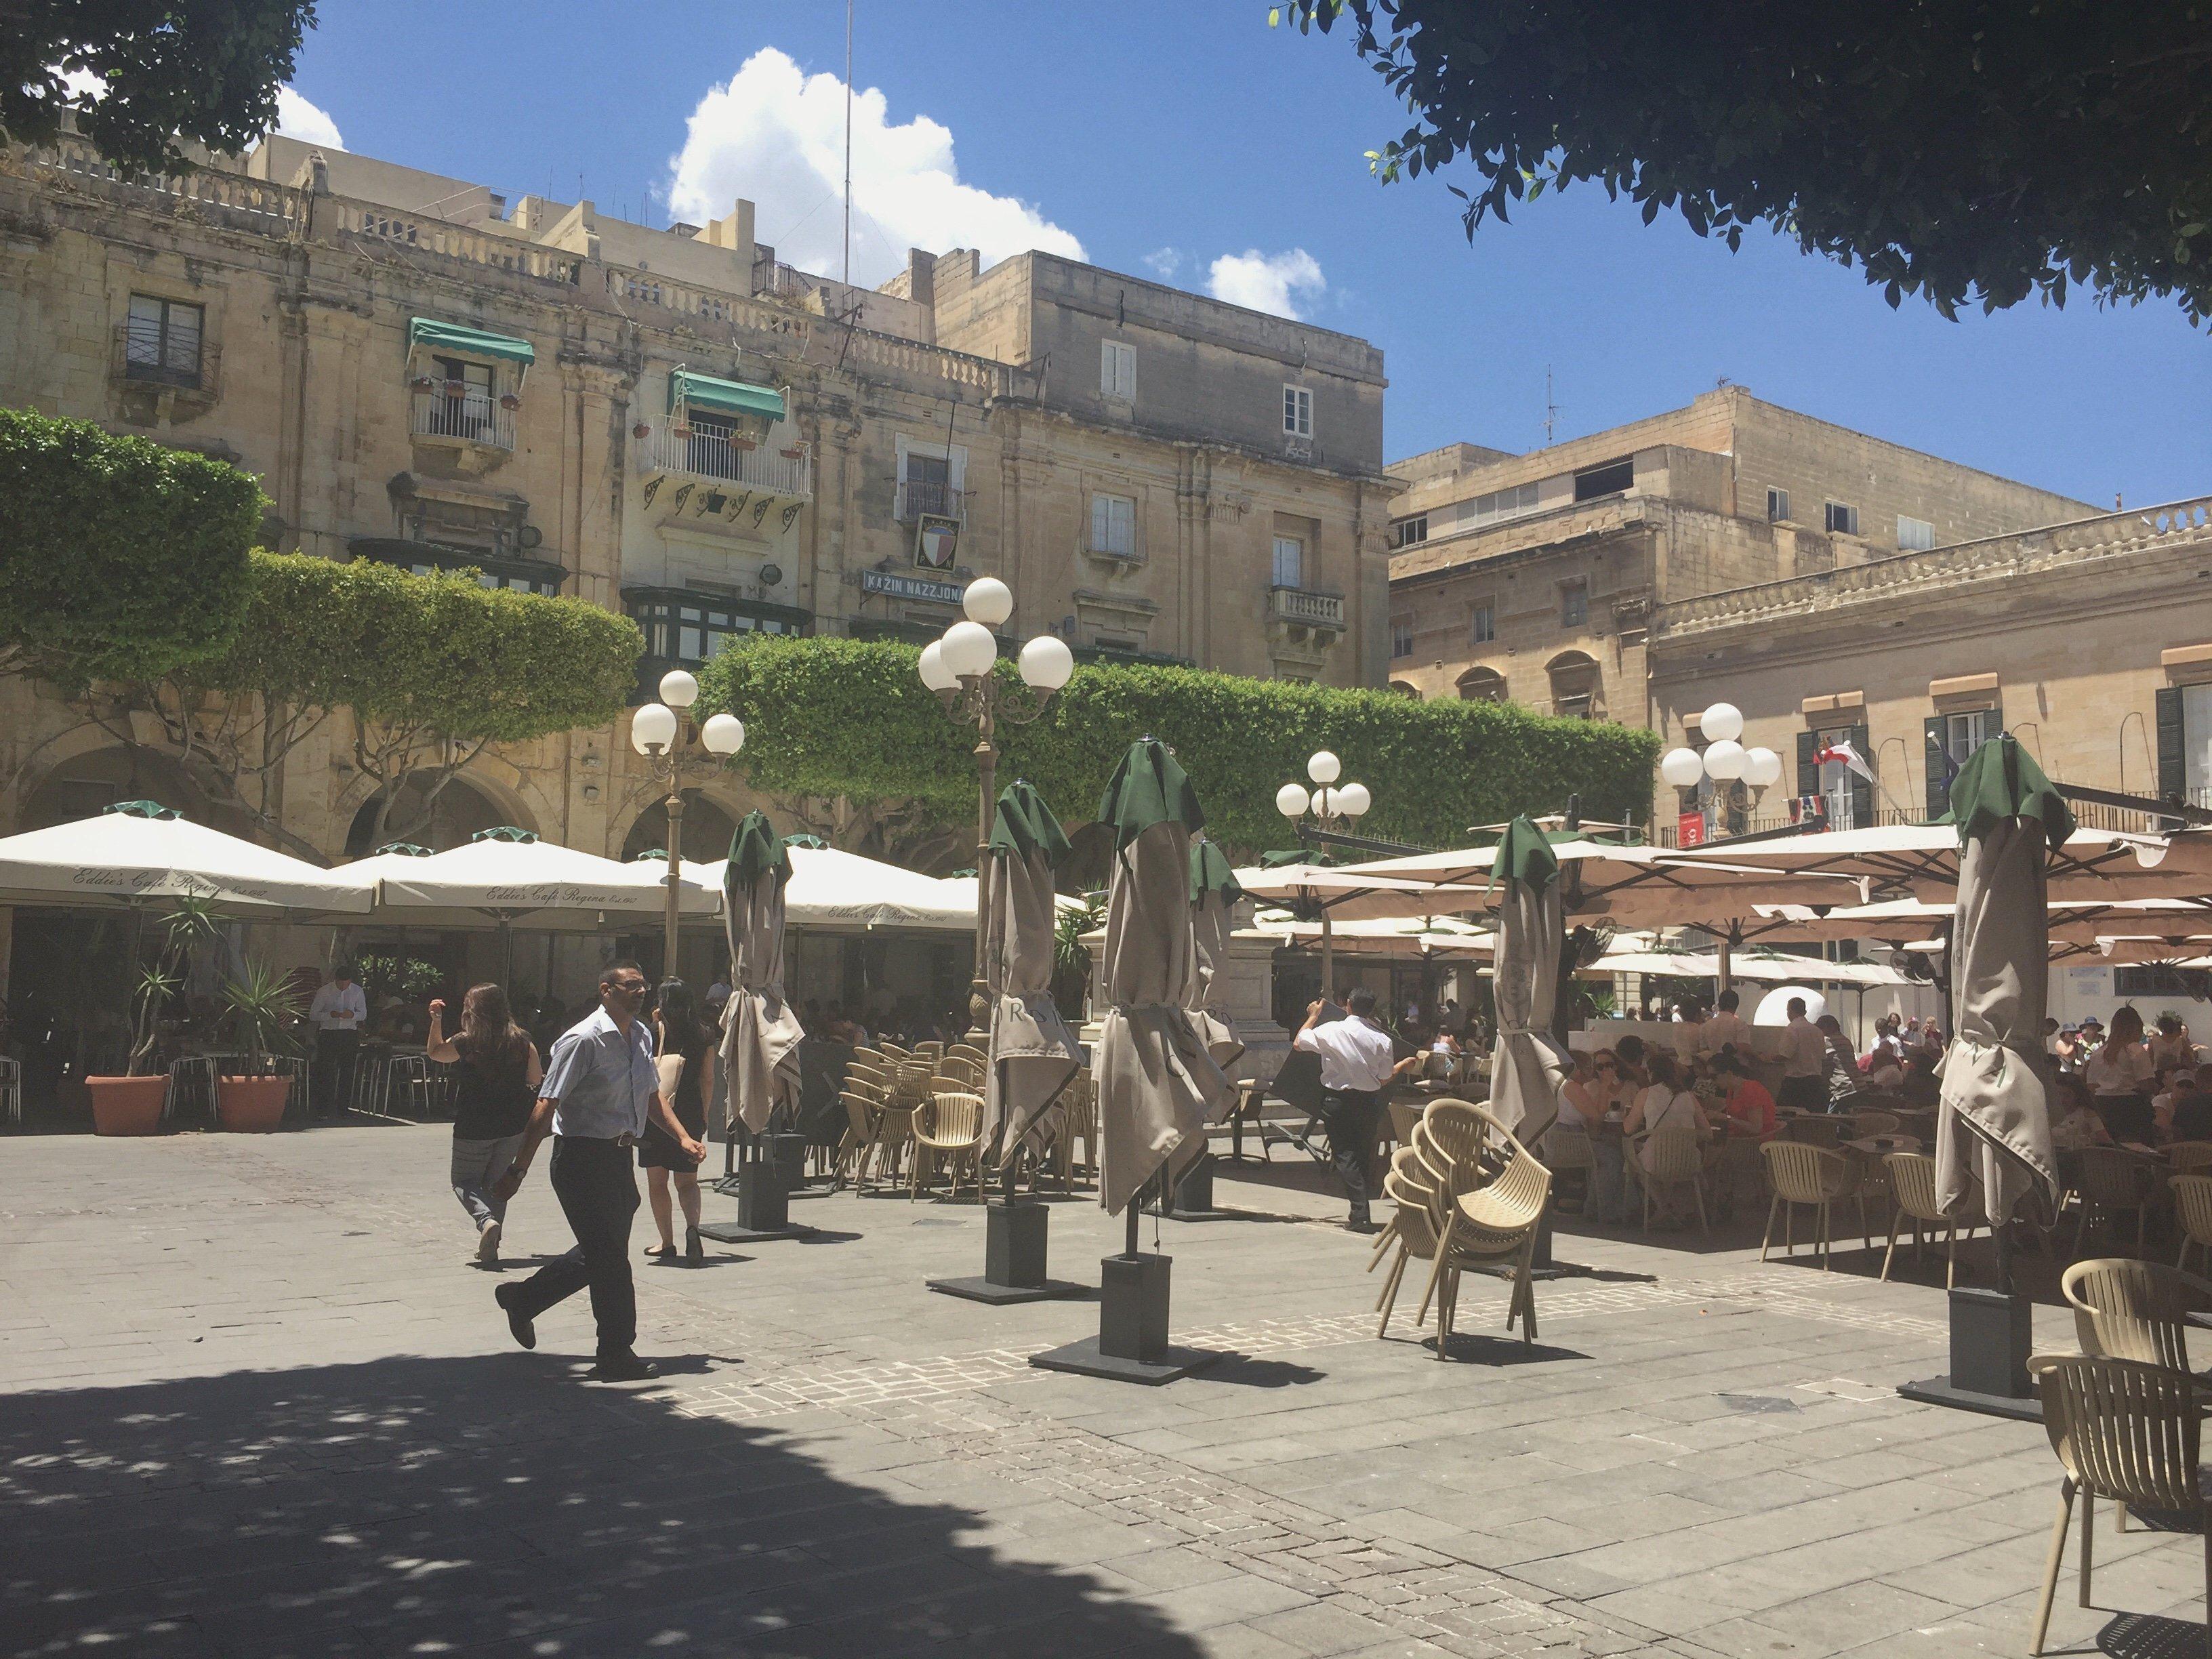 Al Fresco dining in Valletta, Malta